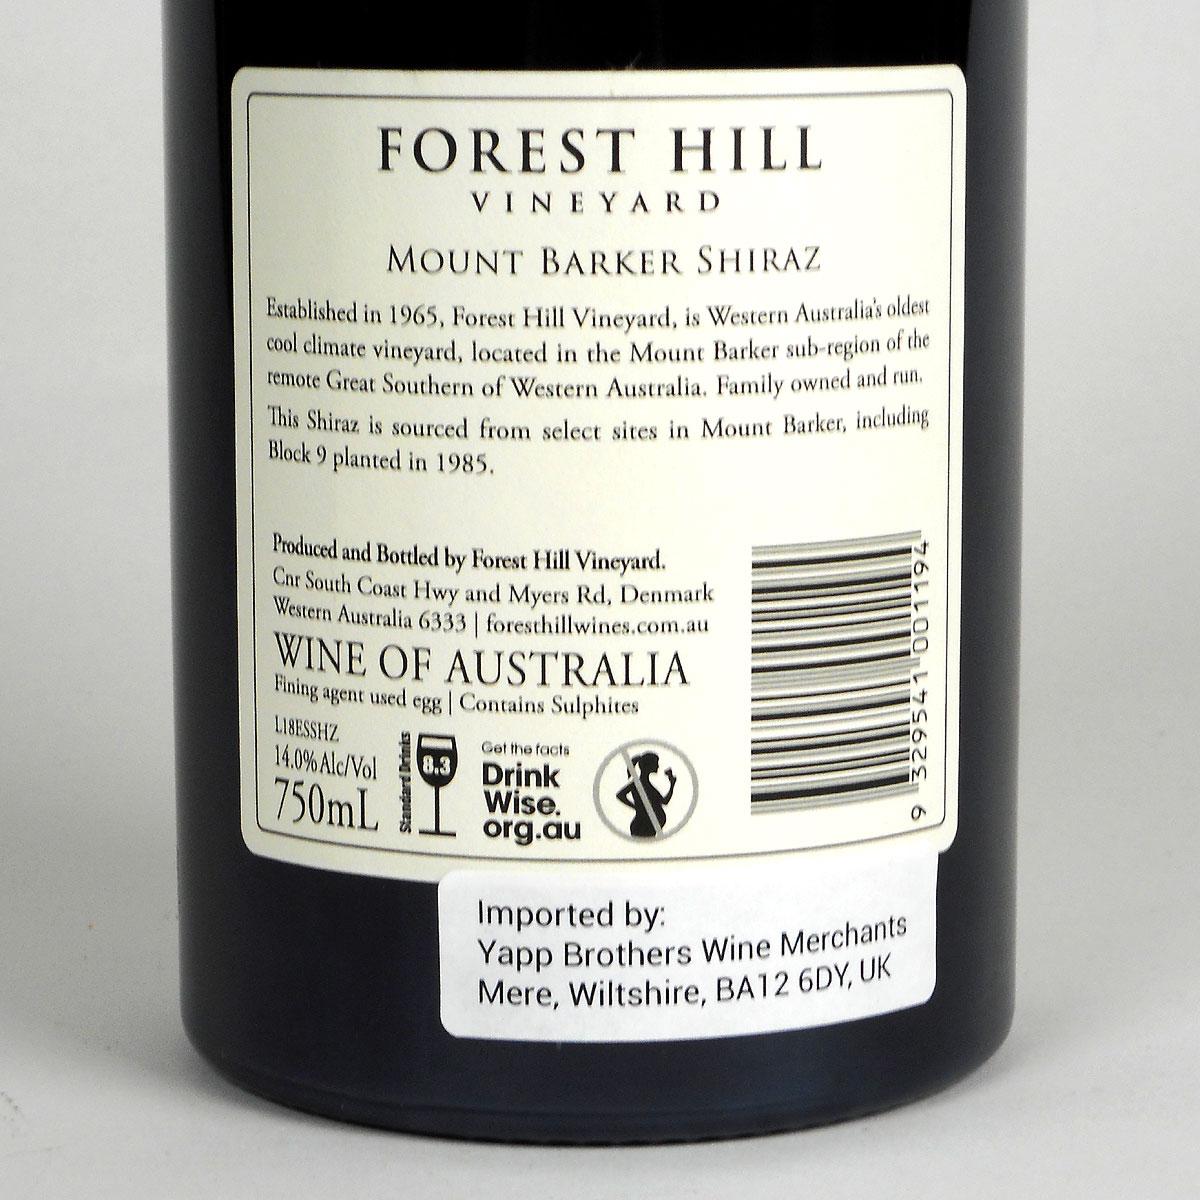 Forest Hill Vineyard: 'Estate' Shiraz 2018 - Bottle Rear Label